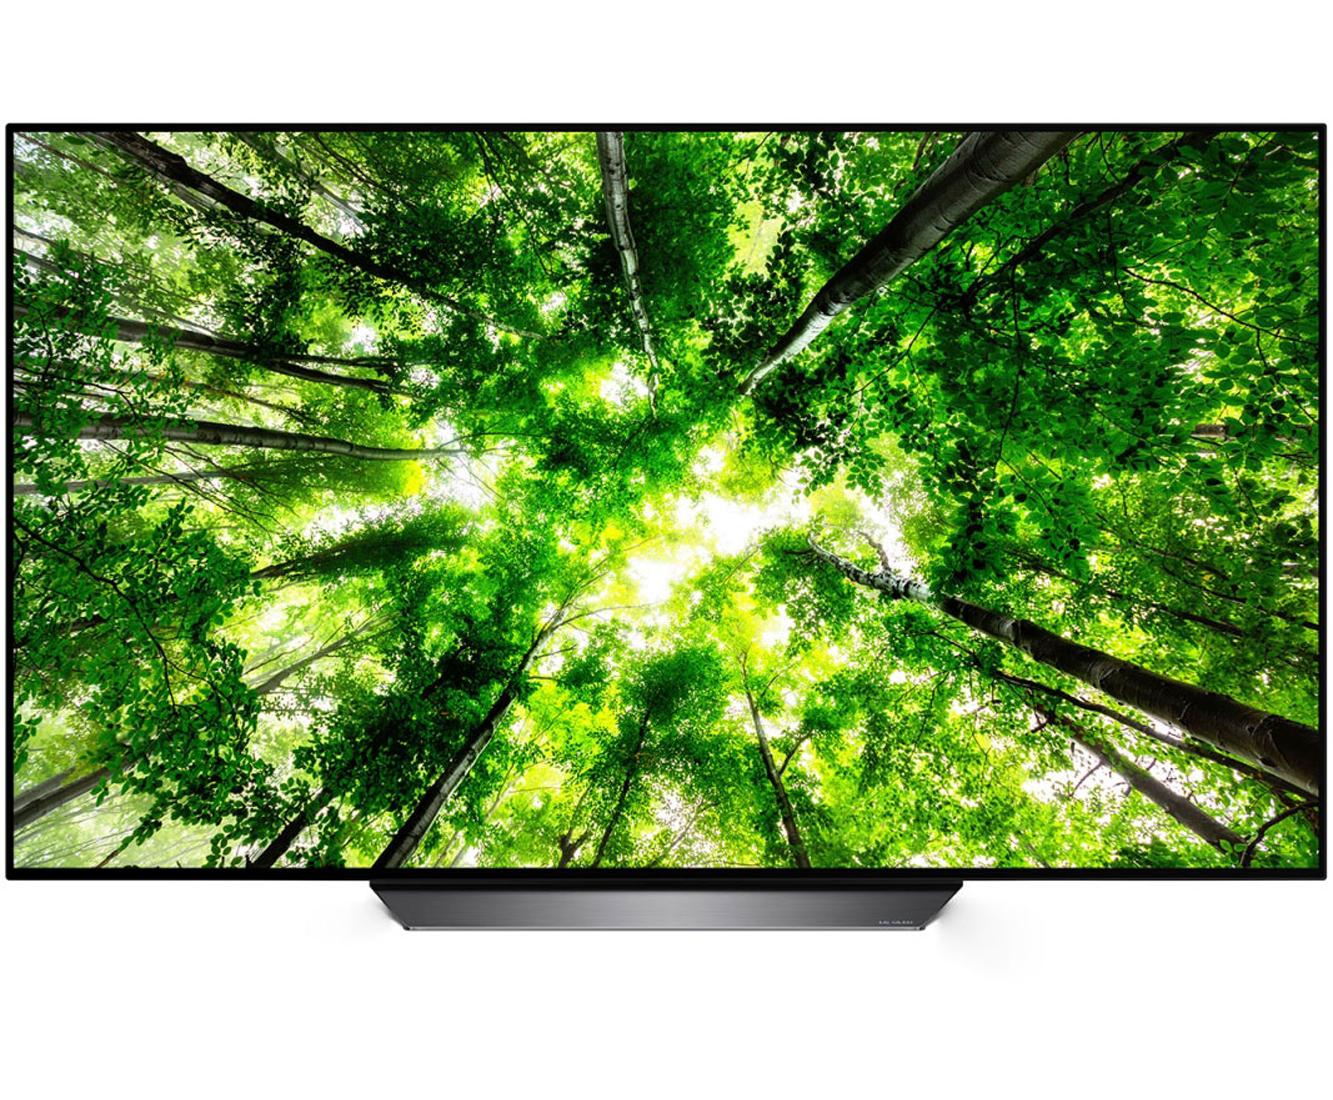 LG OLED55B8PLA 55 inch 4K Ultra HD OLED TV @AO.nl